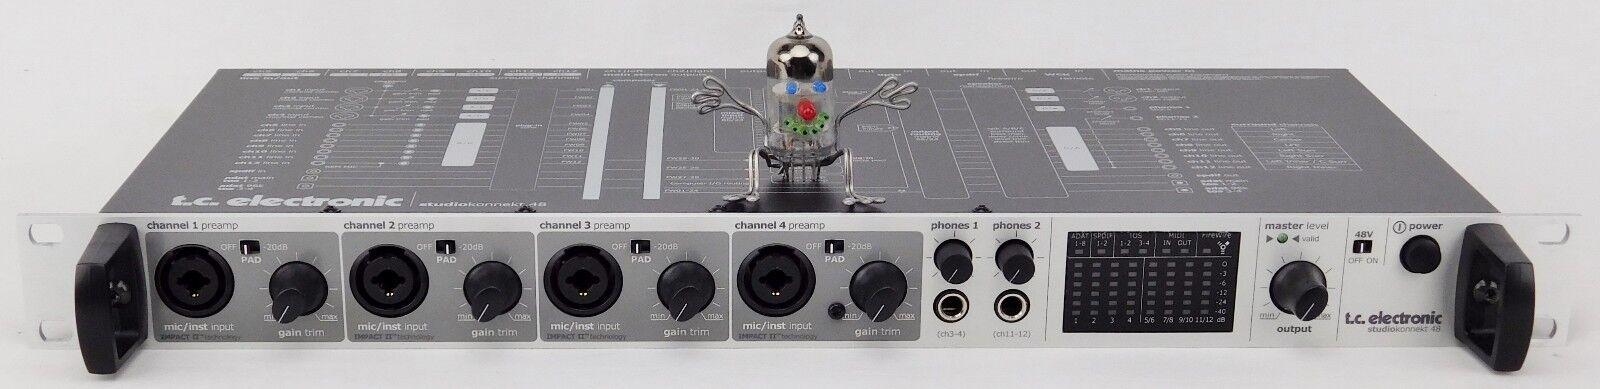 TC Electronic Studio Konnekt 48 Firewire Audio Interface Neuertig Garantie